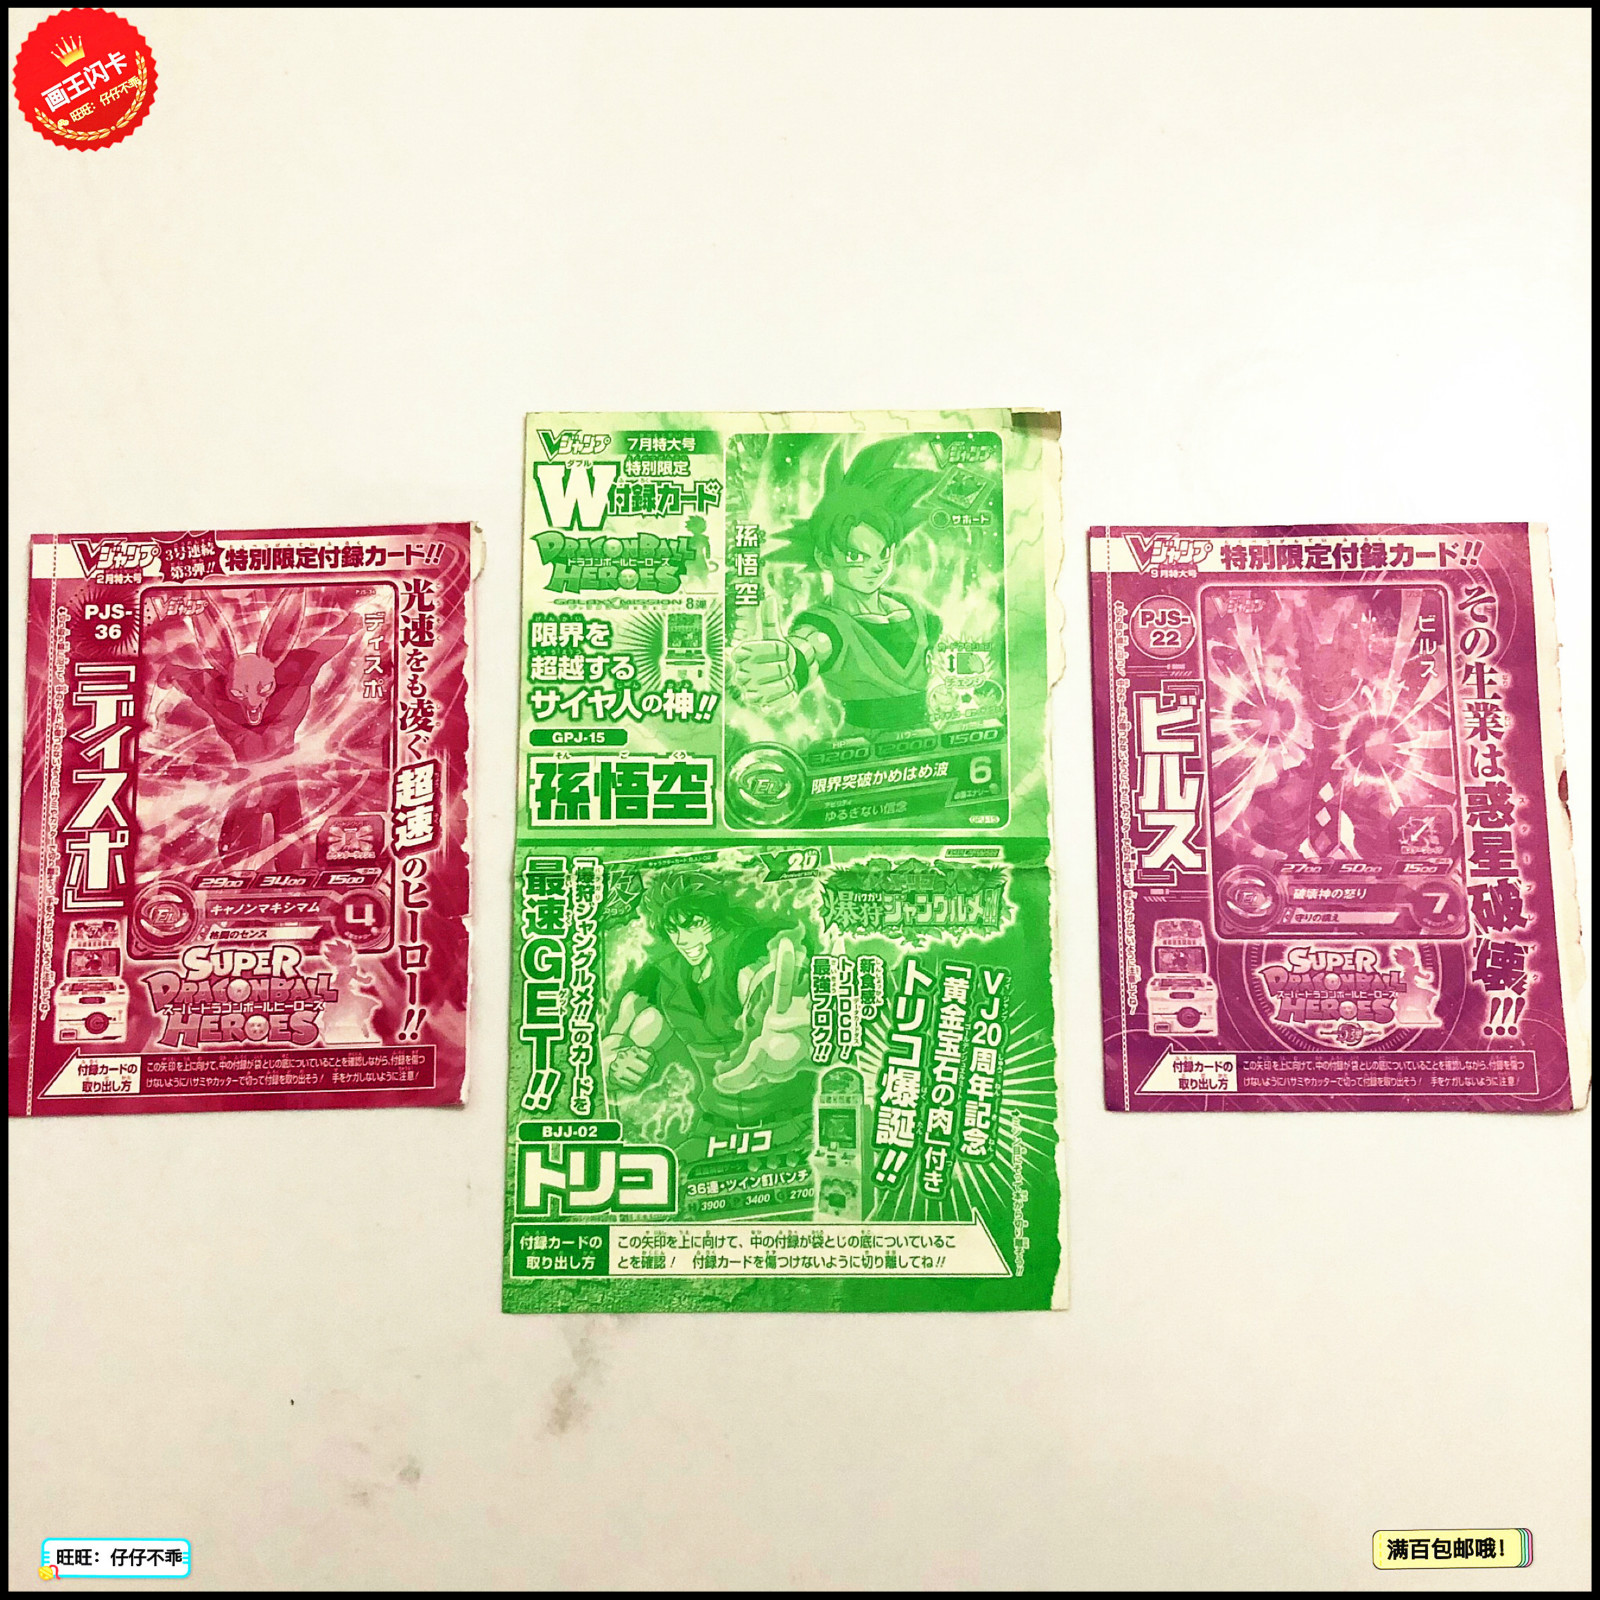 Japan Original Dragon Ball Hero Card Beerus Goku Toys Hobbies Collectibles Game Collection Anime Cards